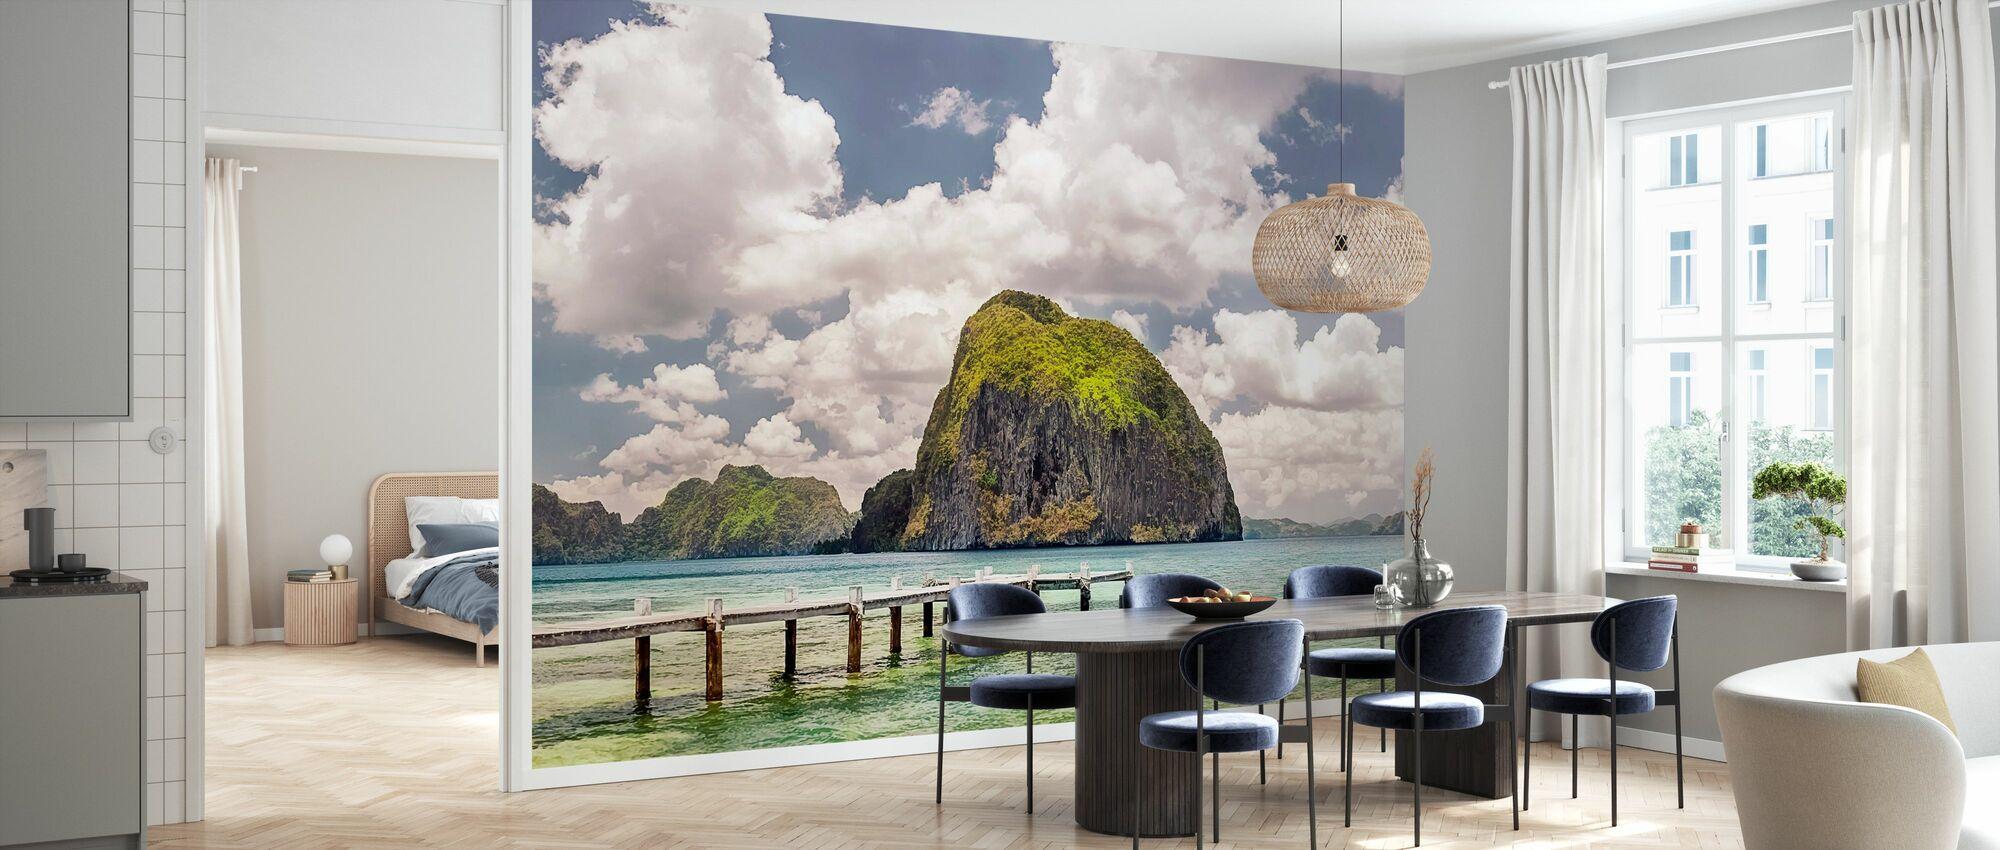 Beautiful Tropical Beach - Wallpaper - Kitchen